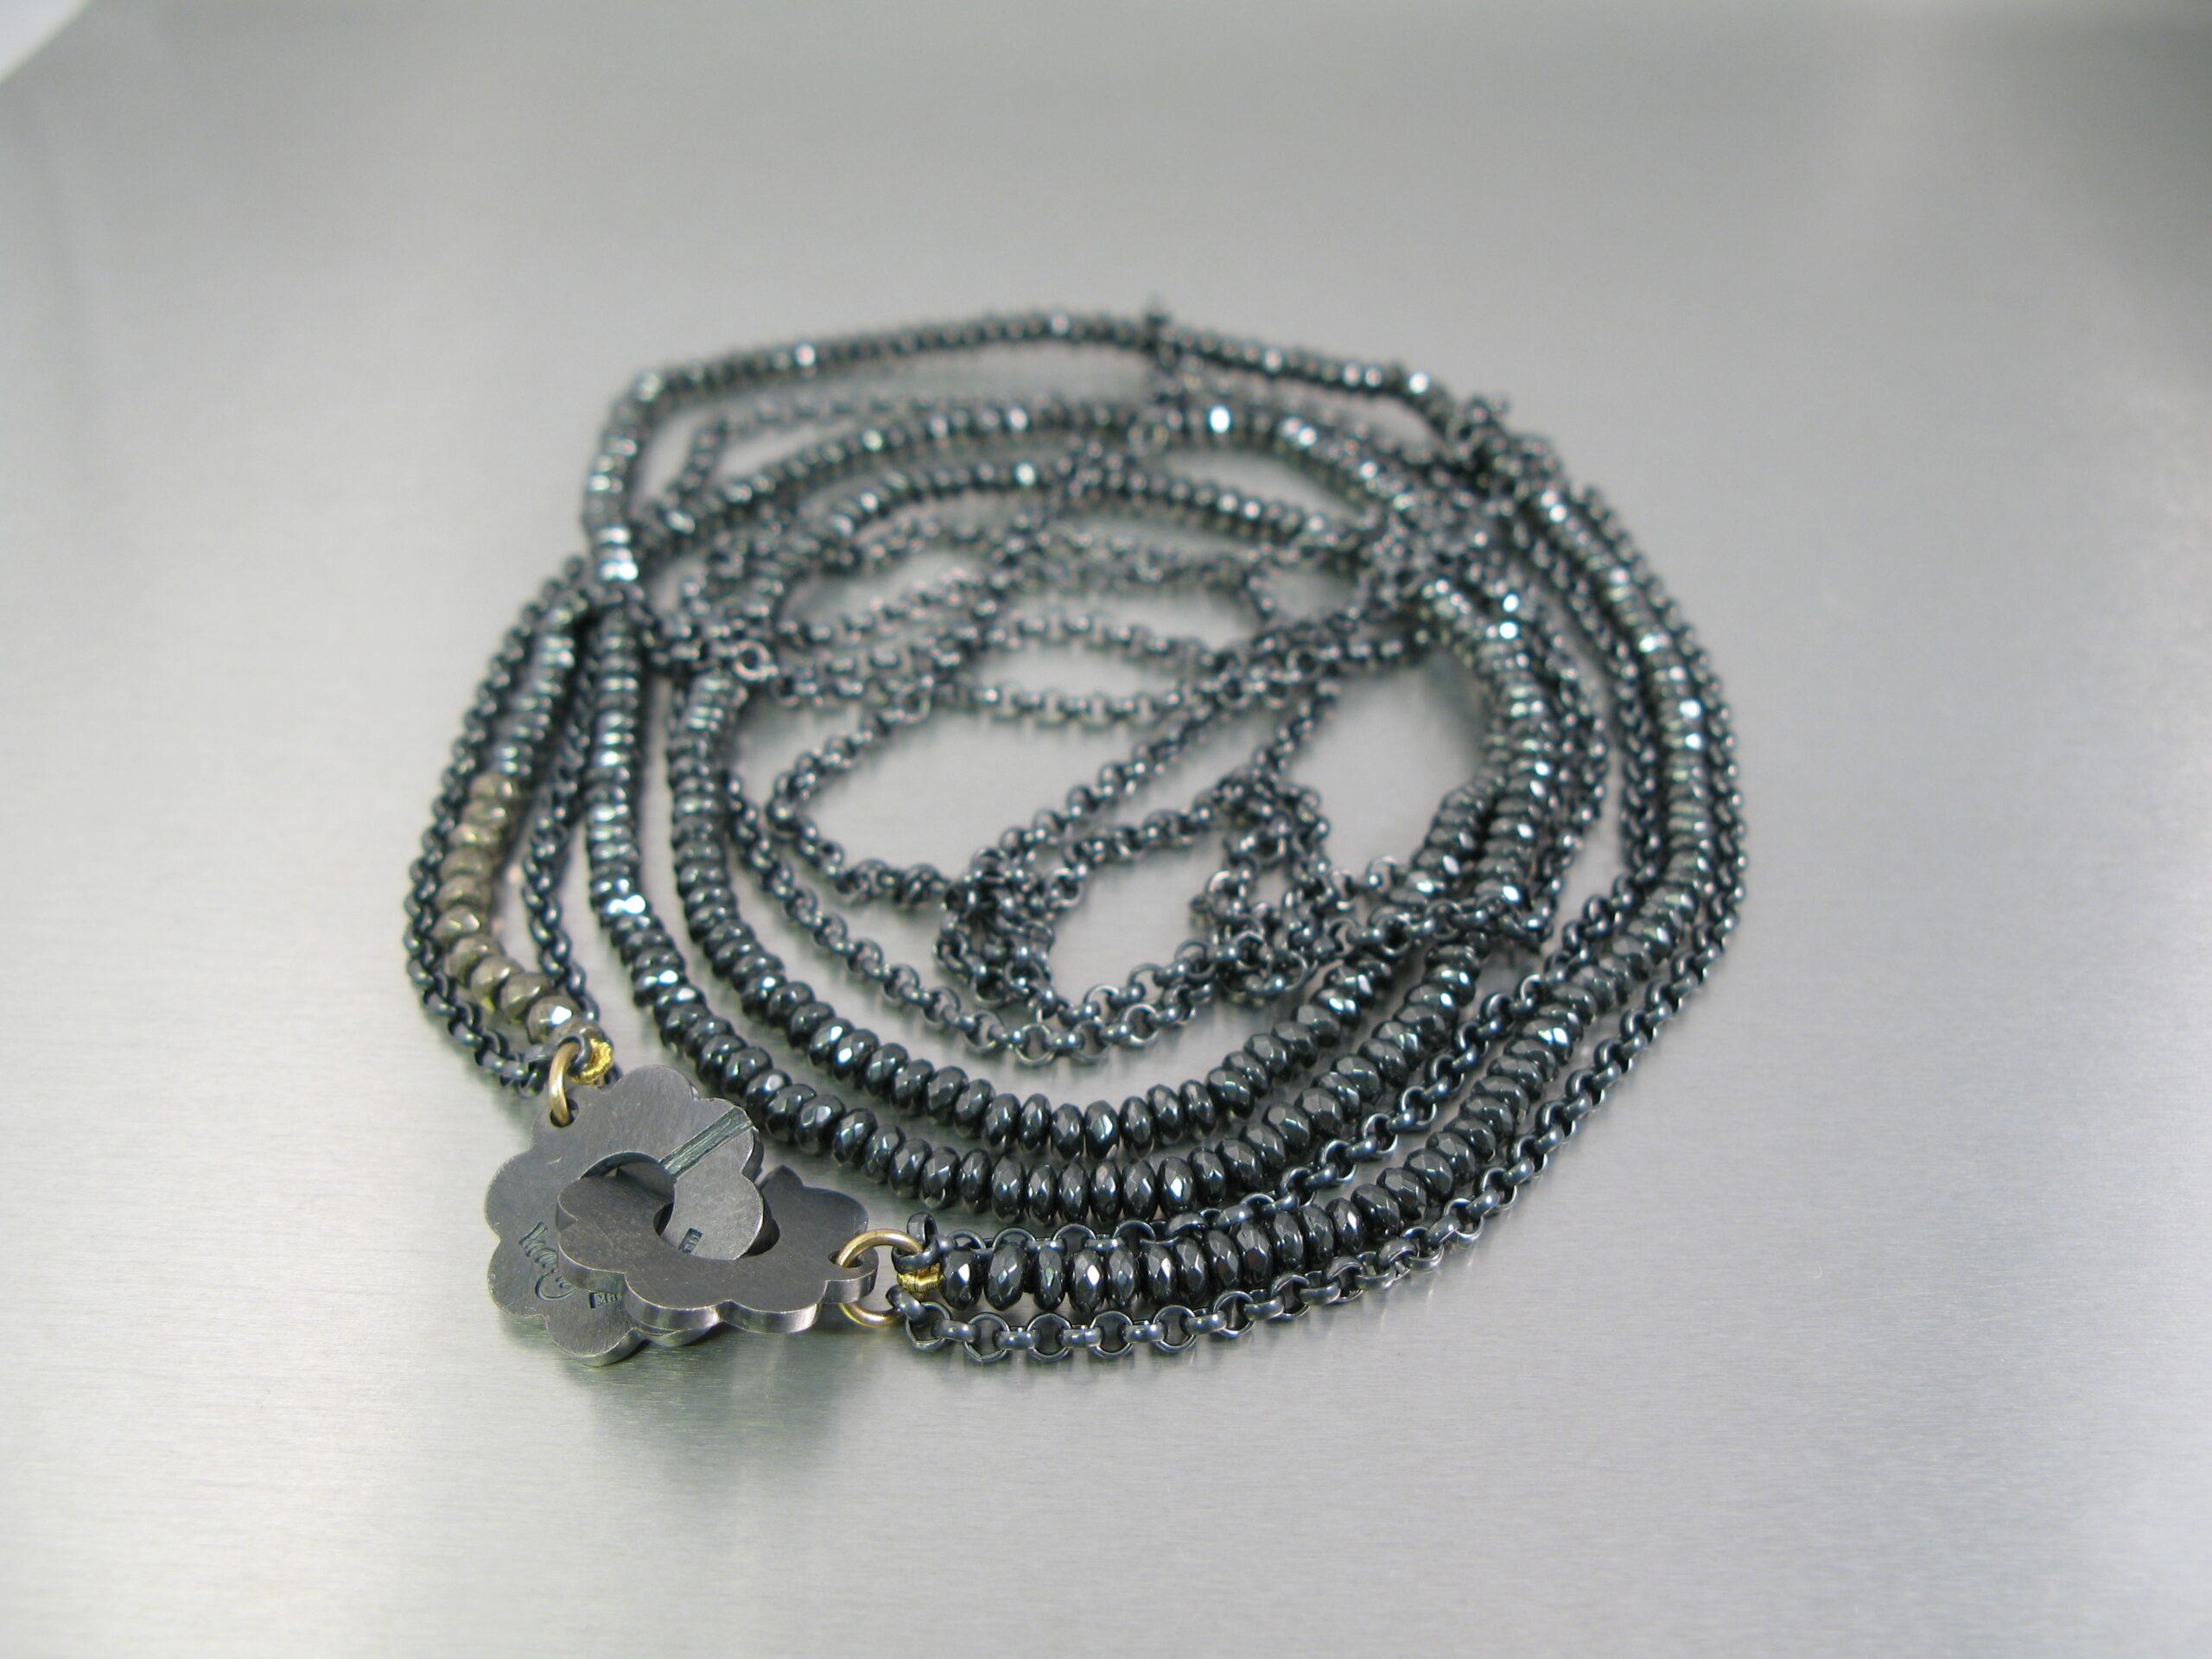 Collier, oxiderat silver, guld, hematit och purit